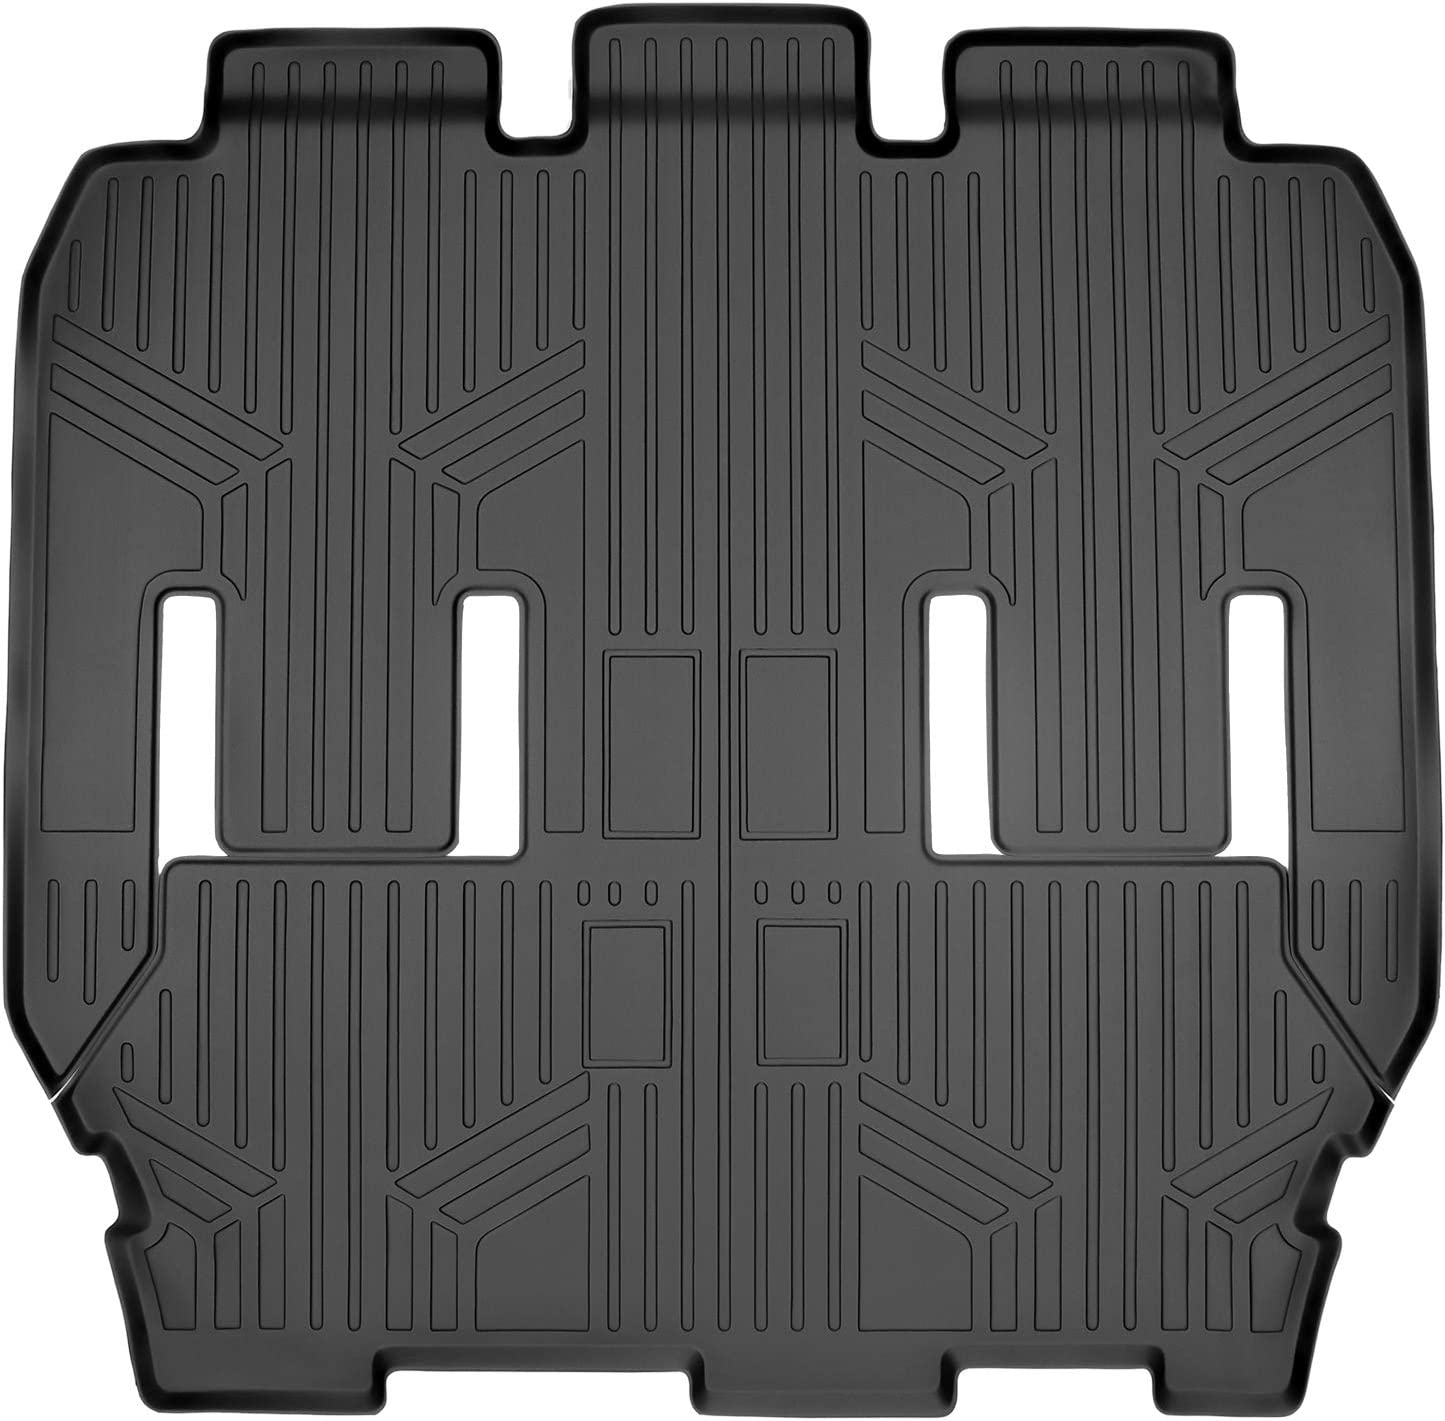 SMARTLINER Floor Mats 2nd and 3rd Row Liner Black for 2017-2020 Chrysler Pacifica 7 or 8 Passenger Model (No Hybrid Models)